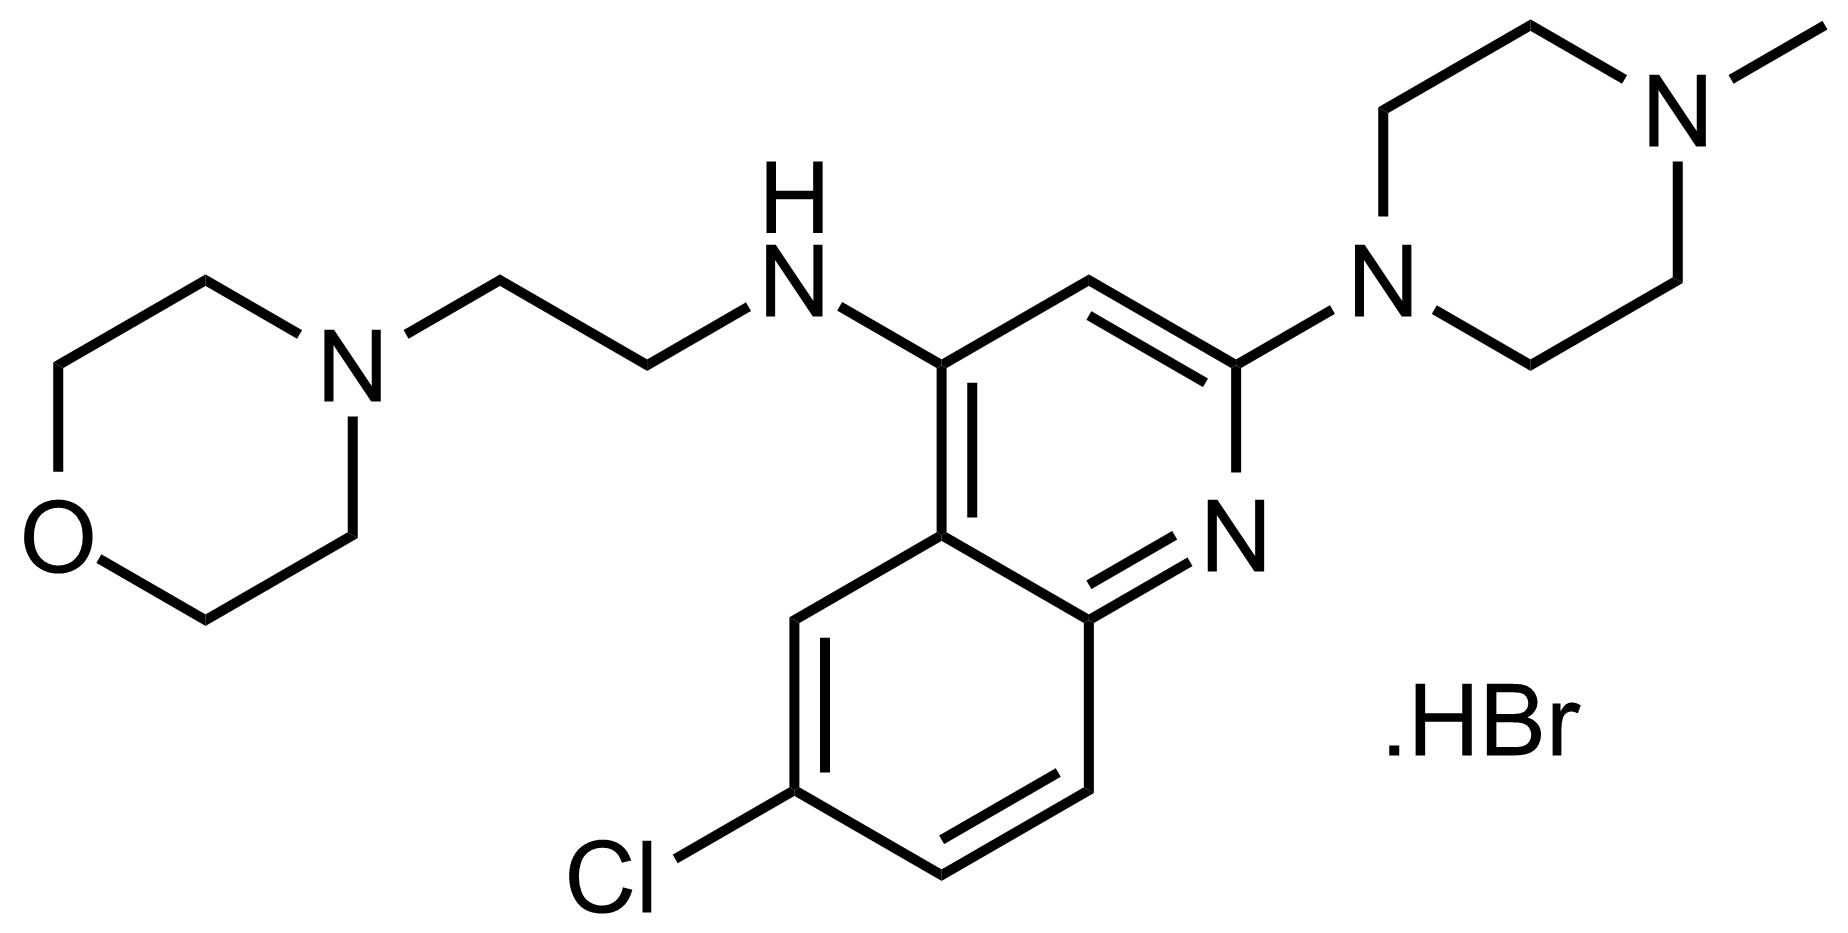 Structure of 6-Chloro-2-(4-methylpiperazin-1-yl)-N-(2-morpholinoethyl)quinolin-4-amine hydrobromide